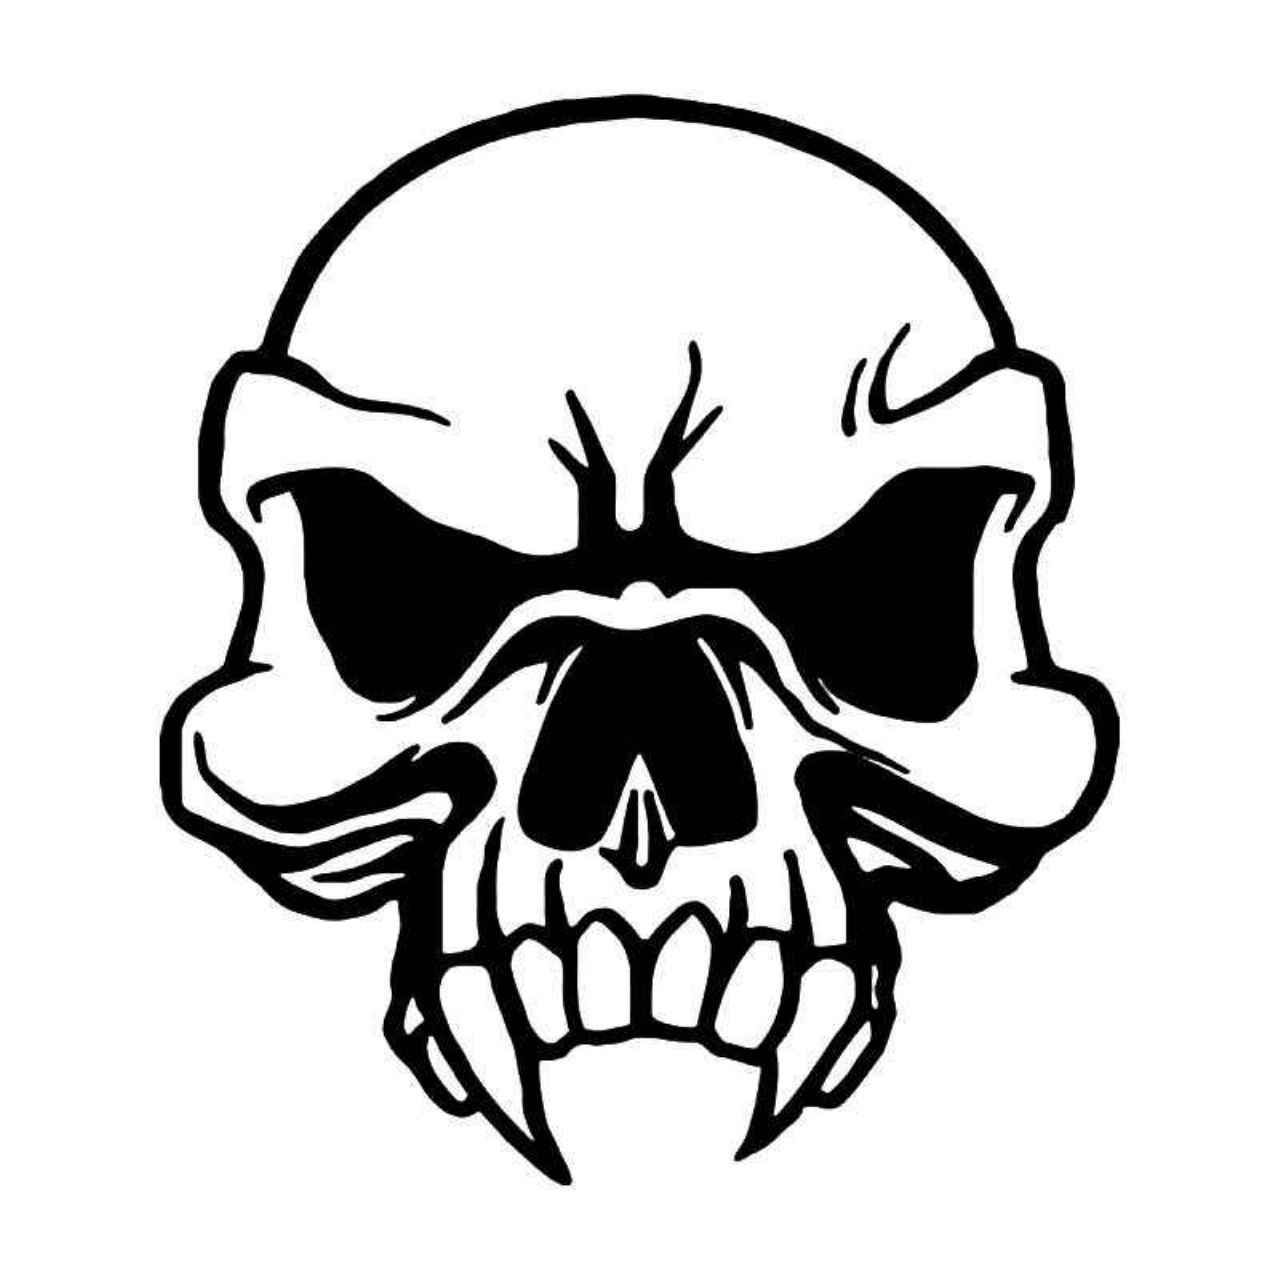 Tribal Vampire Skull 4 Vinyl Decal Sticker Ballzbeatz